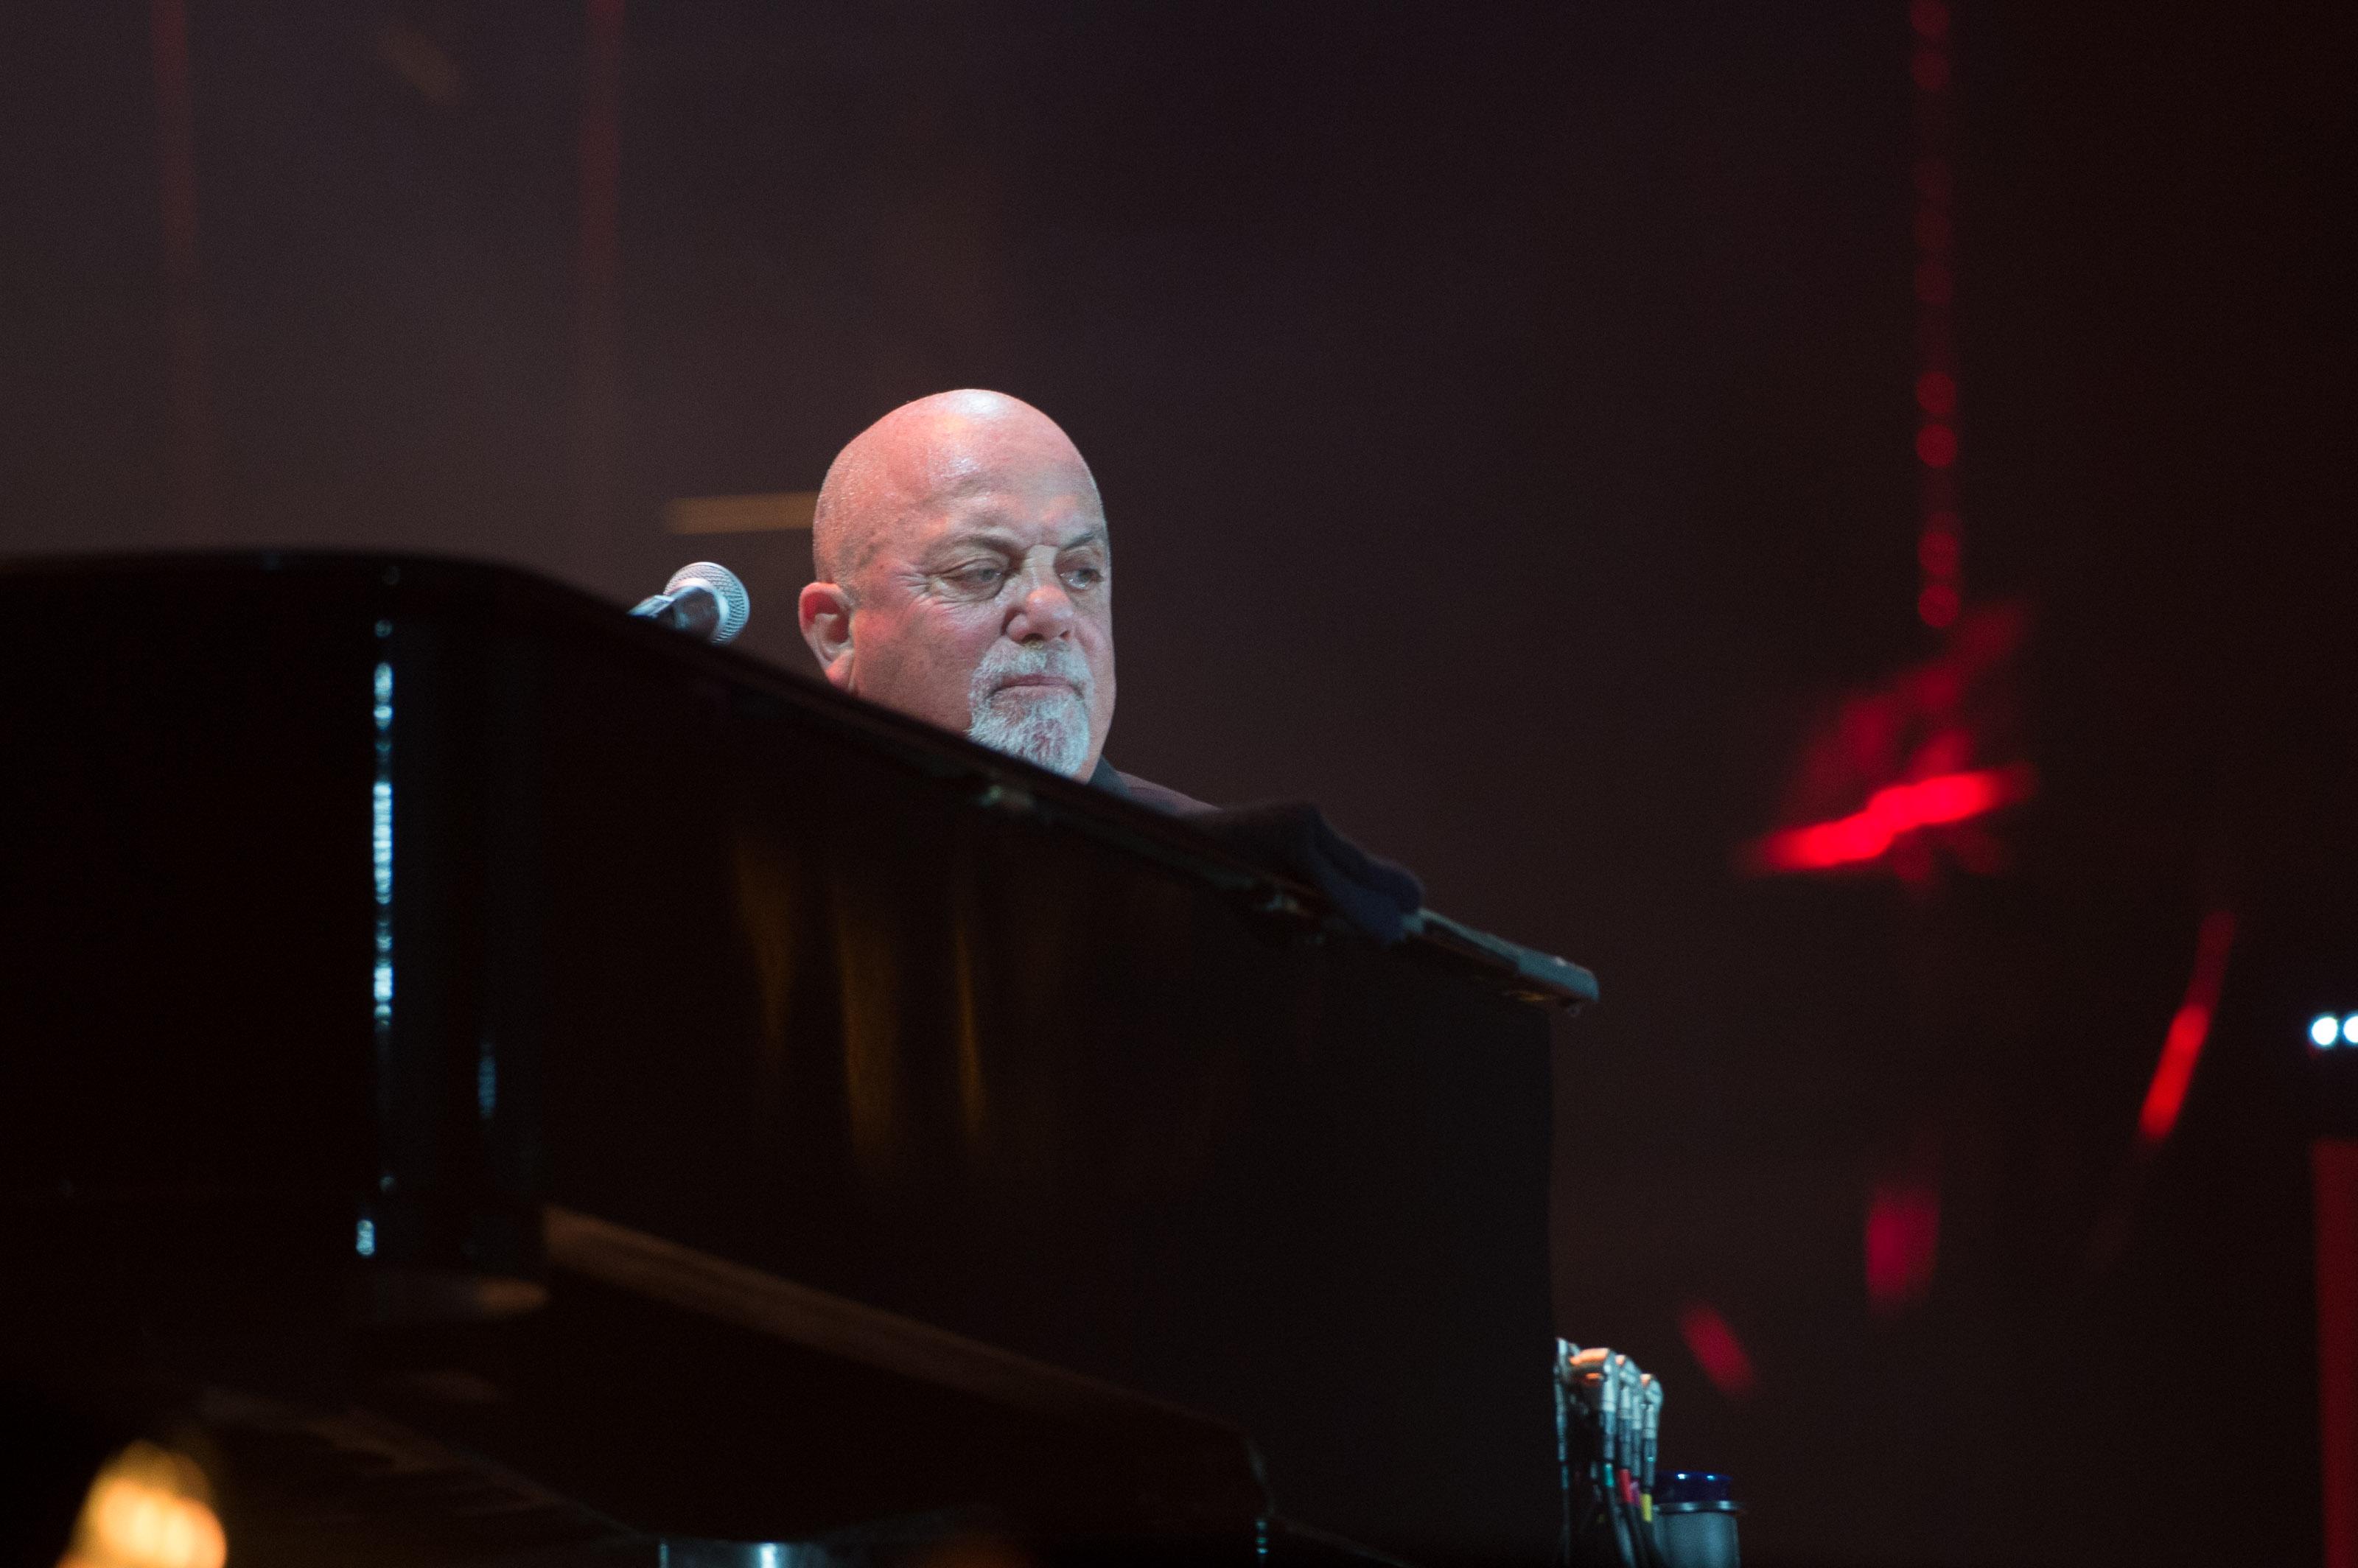 Billy Joel Returns to Wrigley Field in Chicago, Illinois, 8/26/16